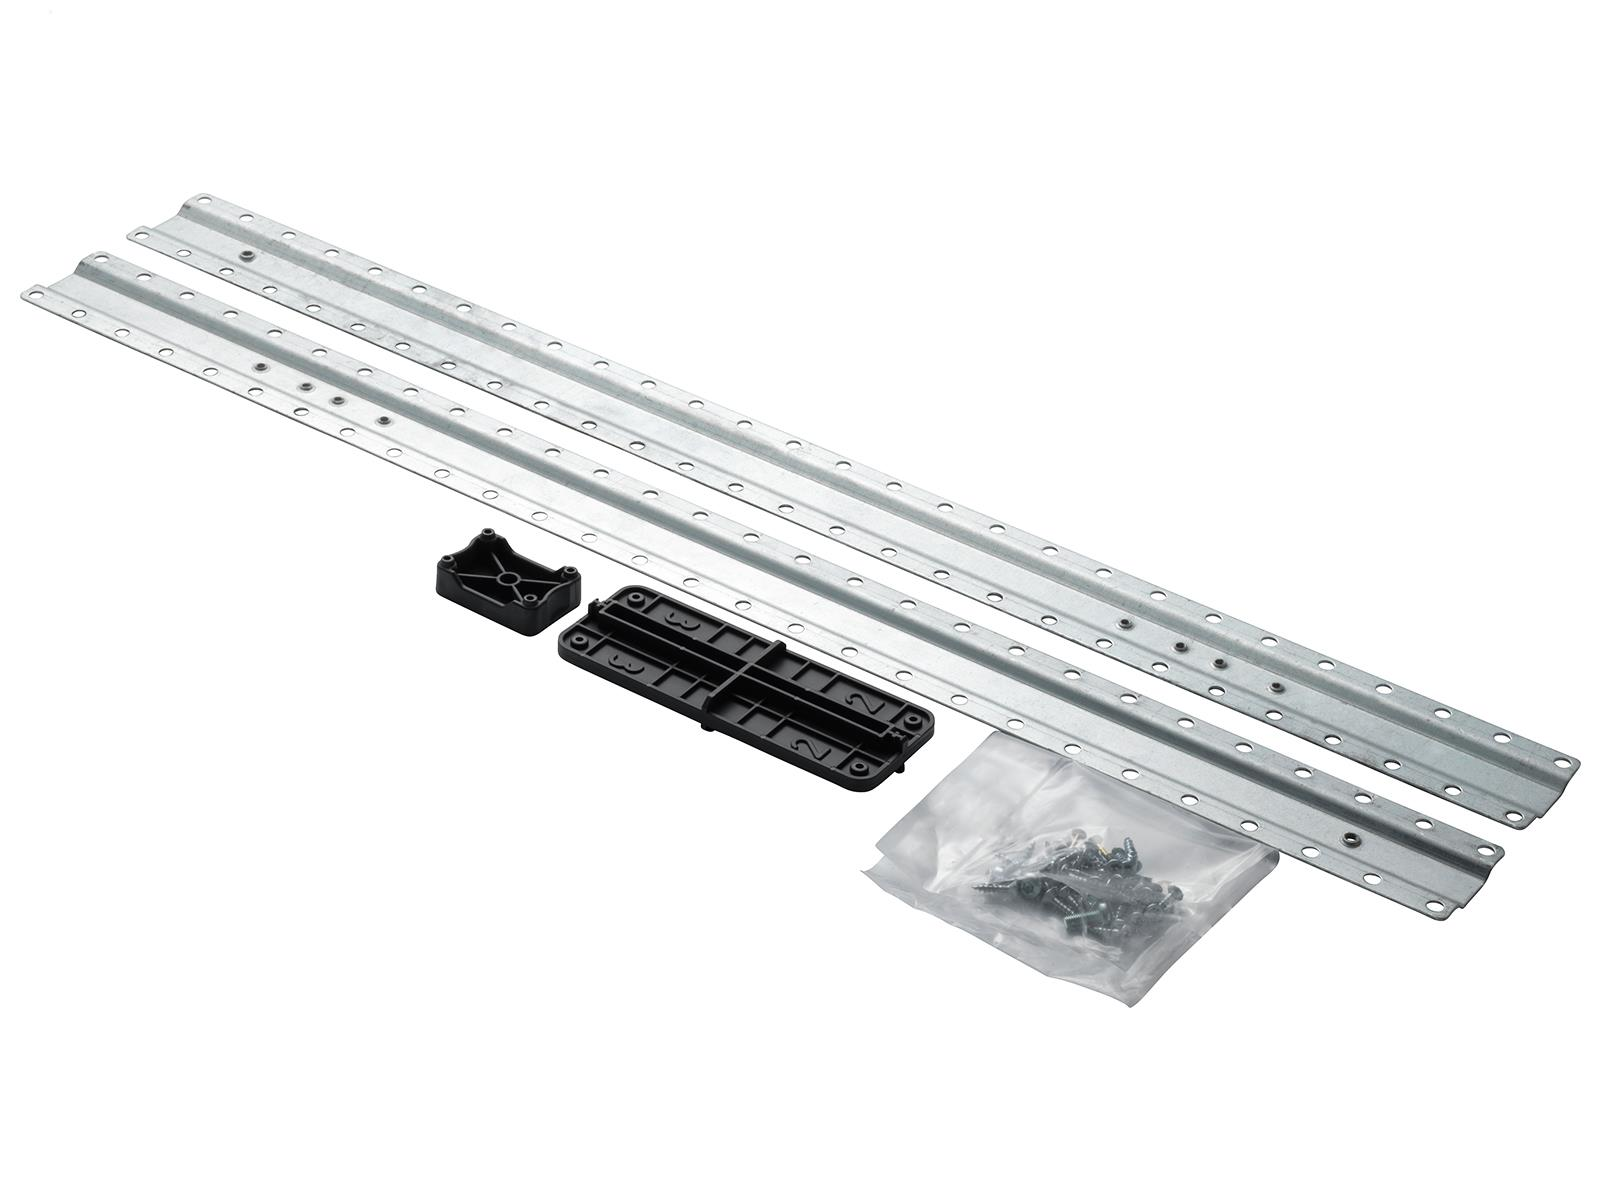 AEG M2DK2 PerfectFit Geschirrspüler-Türblenden-InstallationsKit